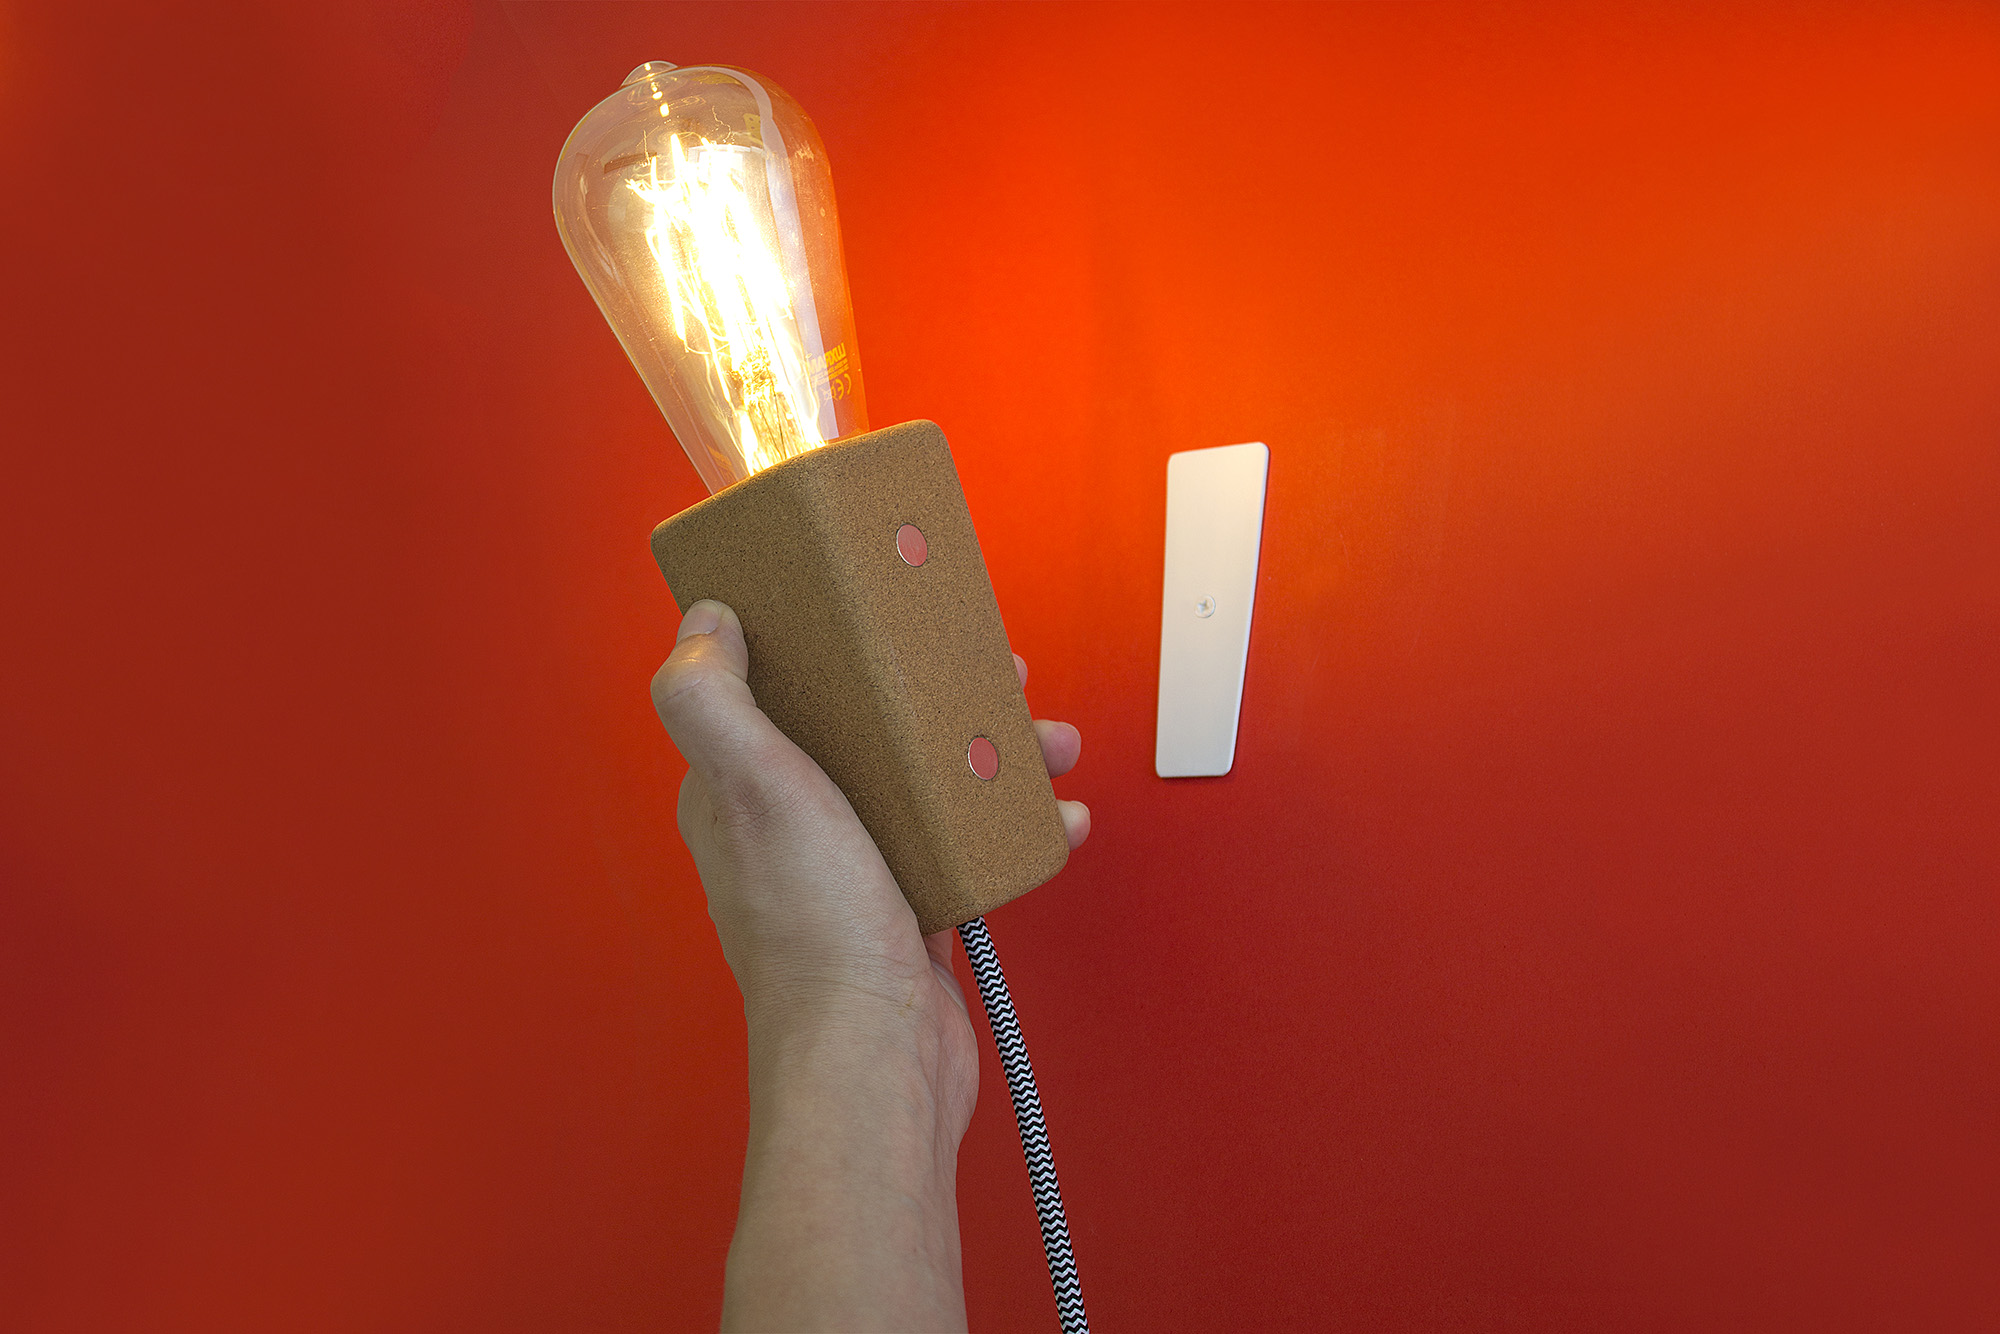 low-Galula-magneto-lamp-amb-11.jpg